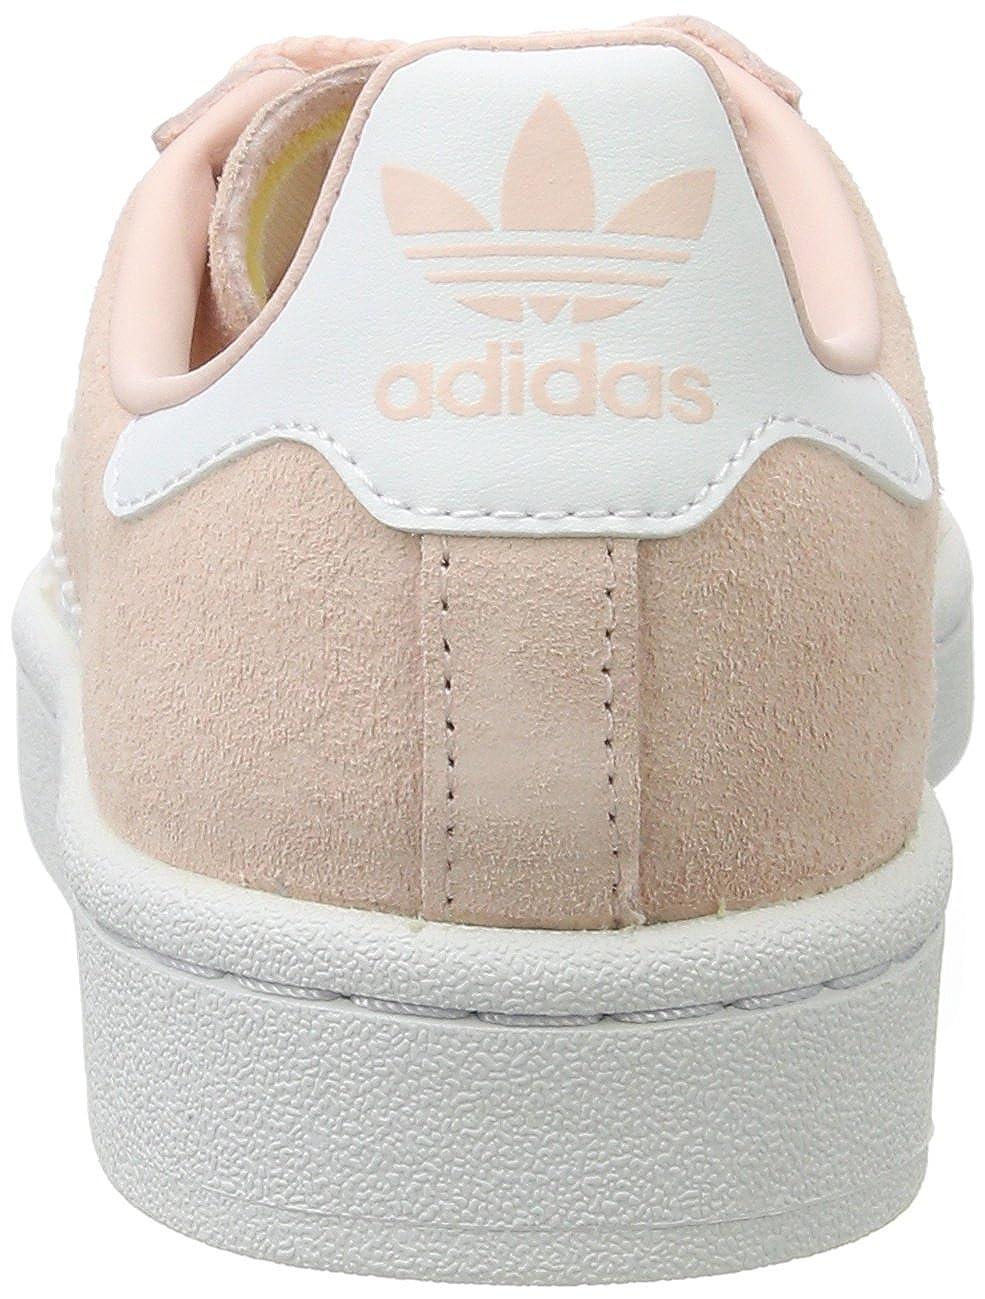 competitive price 1cd38 131f1 Campus Sneaker Handtaschen Damen Schuhe Adidas amp O7xqFET